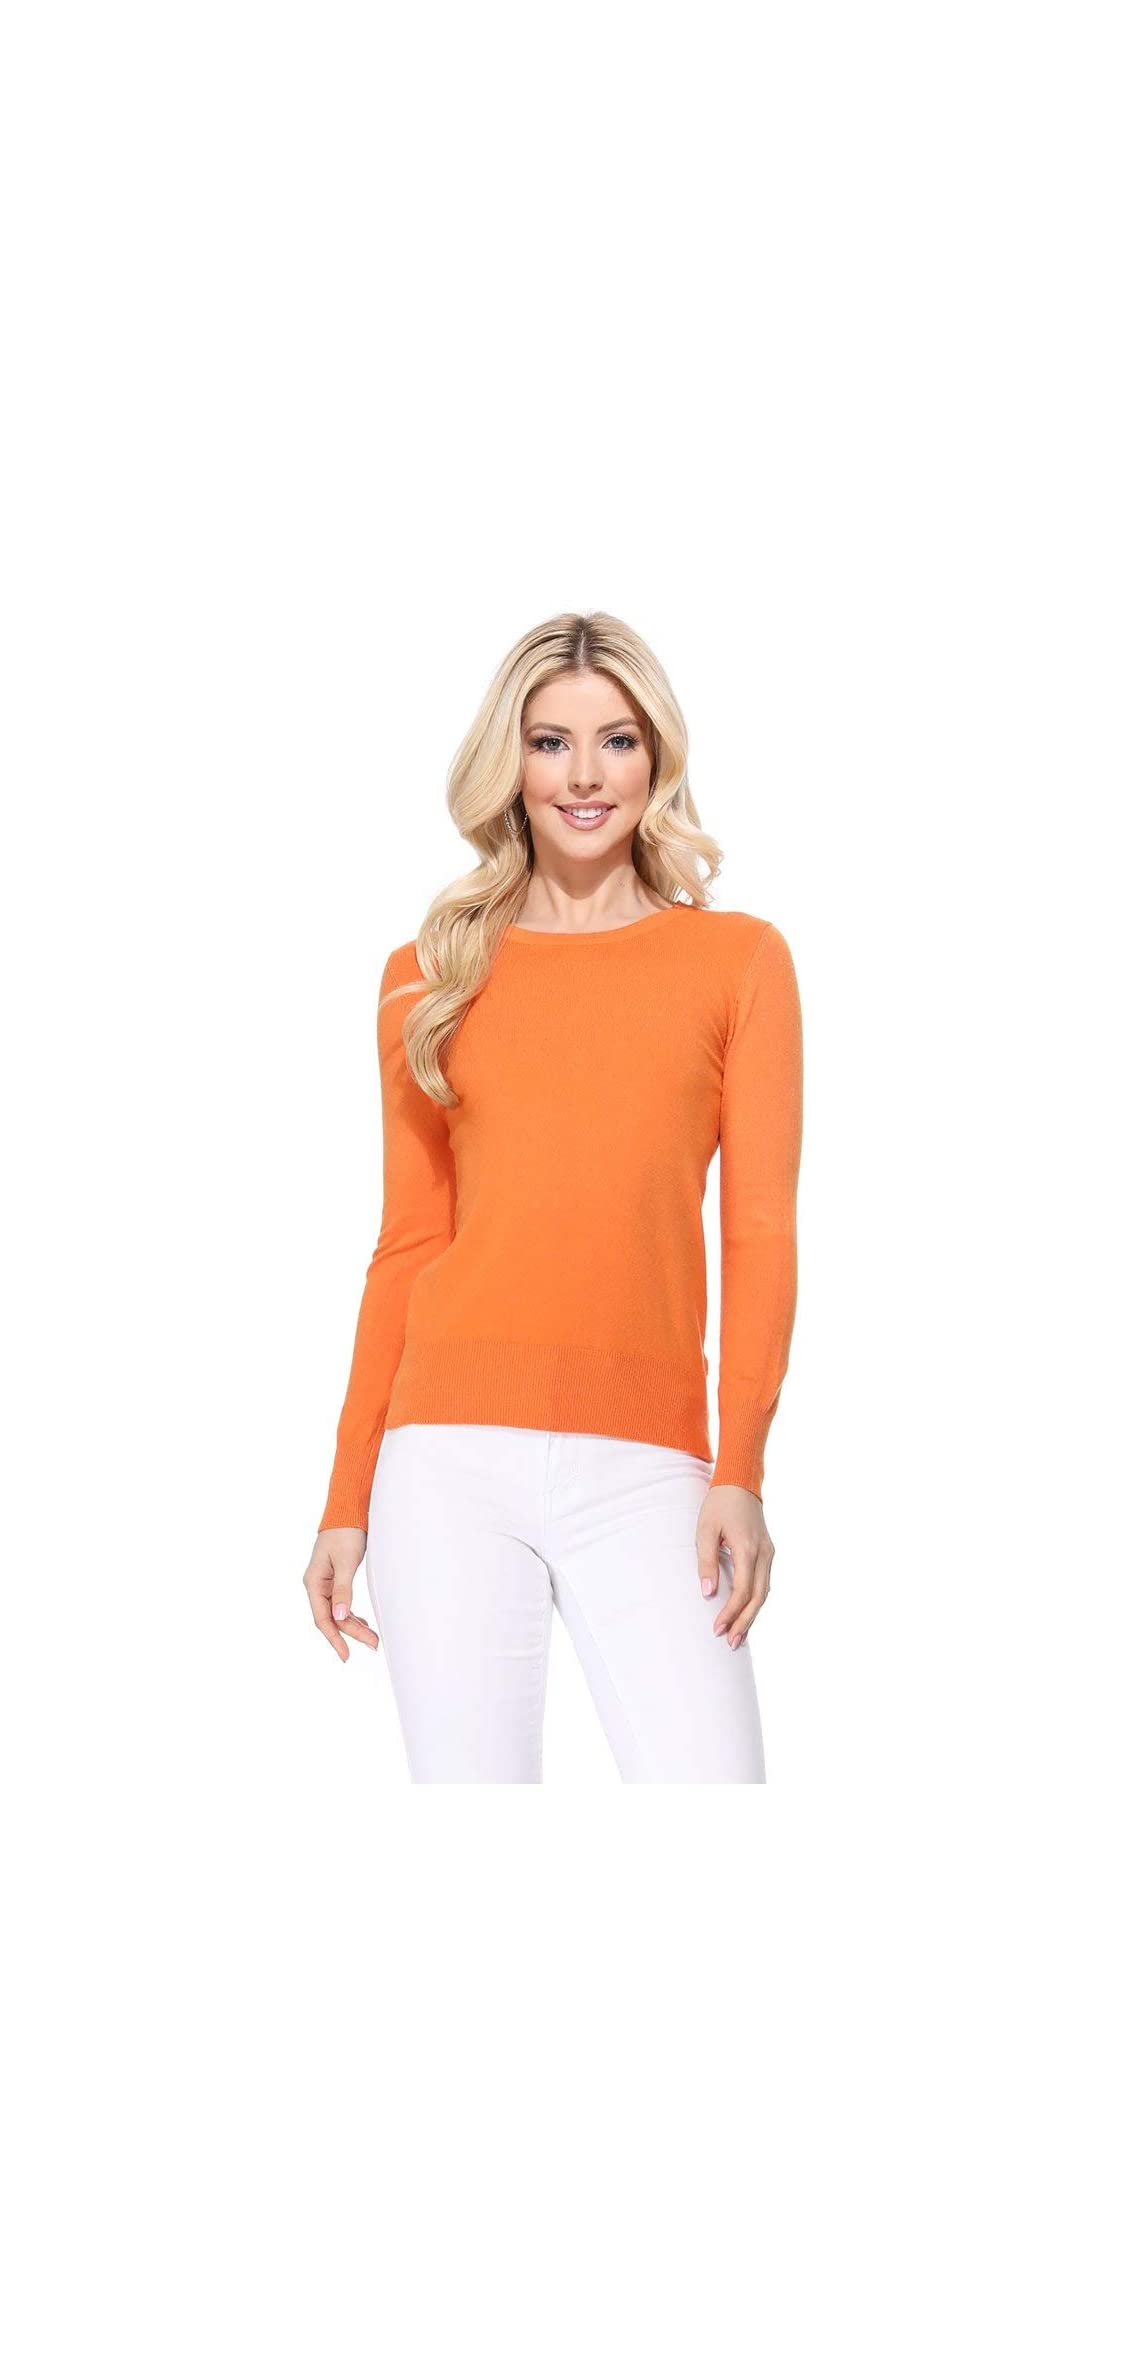 Women's Long Sleeve V-neck Basic Soft Knit T-shirt Sweater